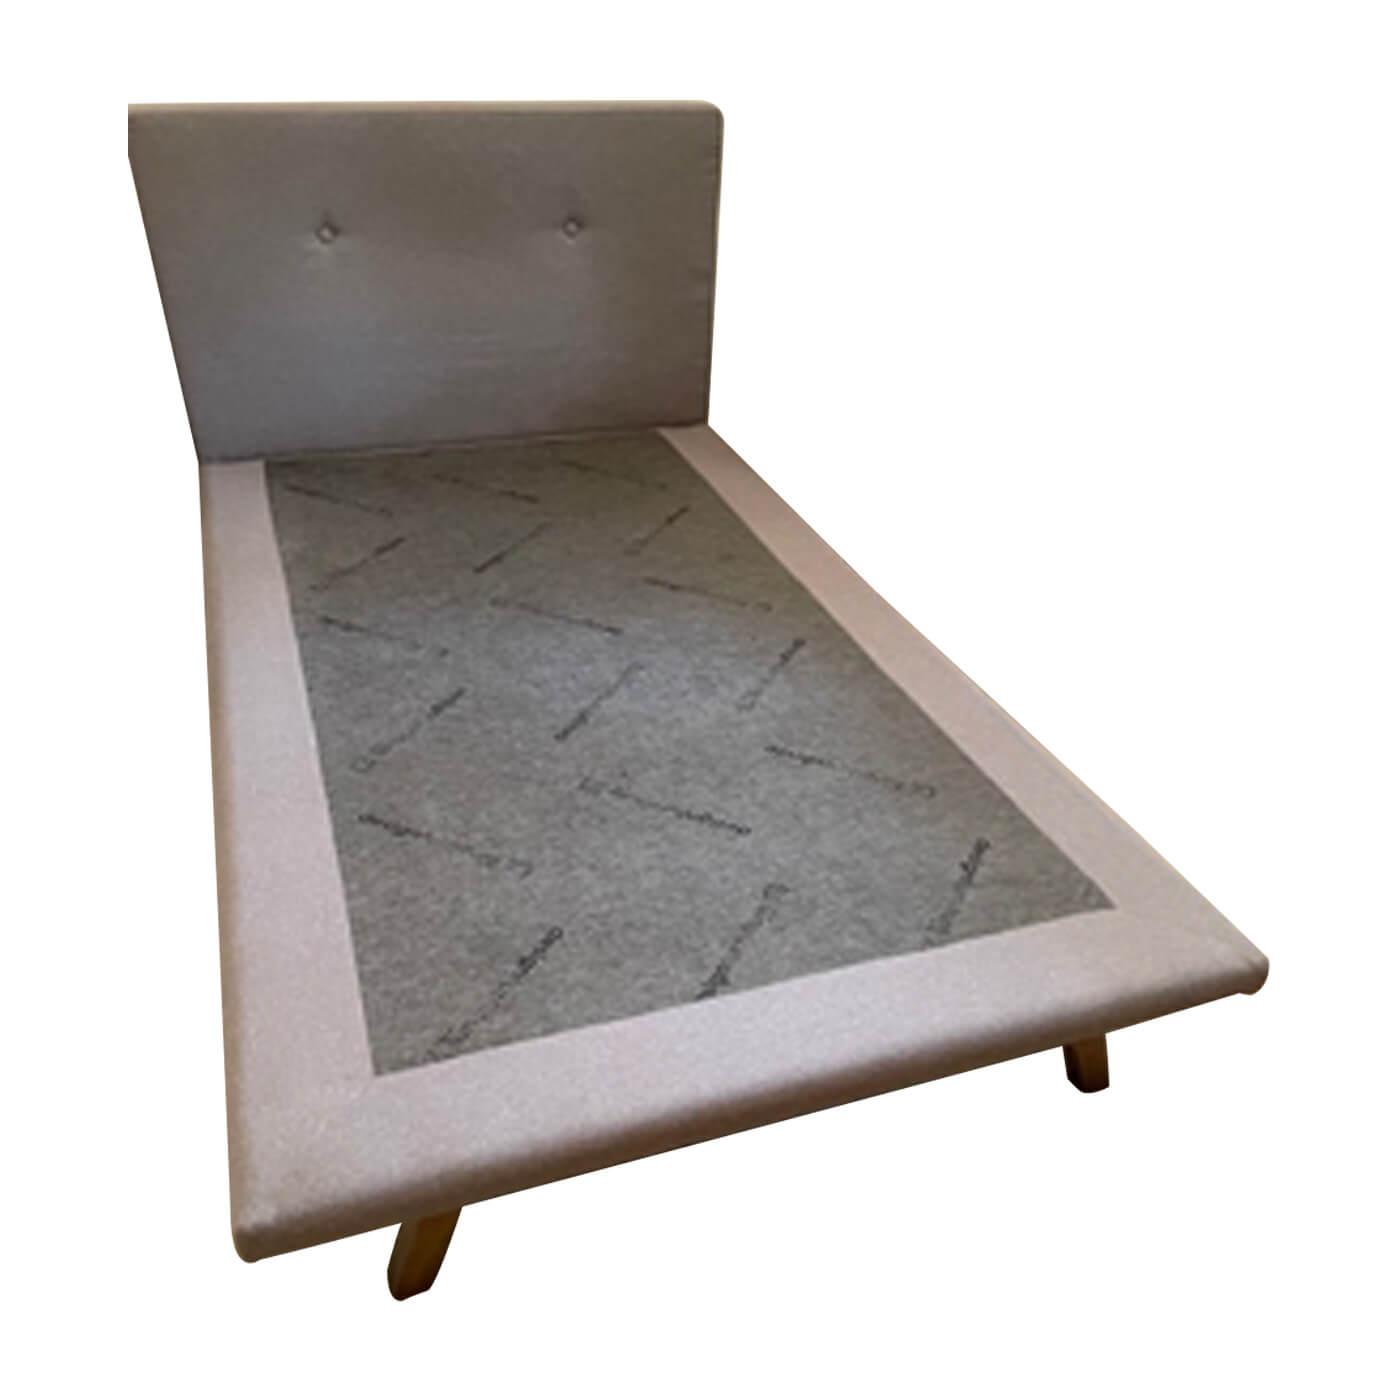 Design Furniture Ekko Single beds